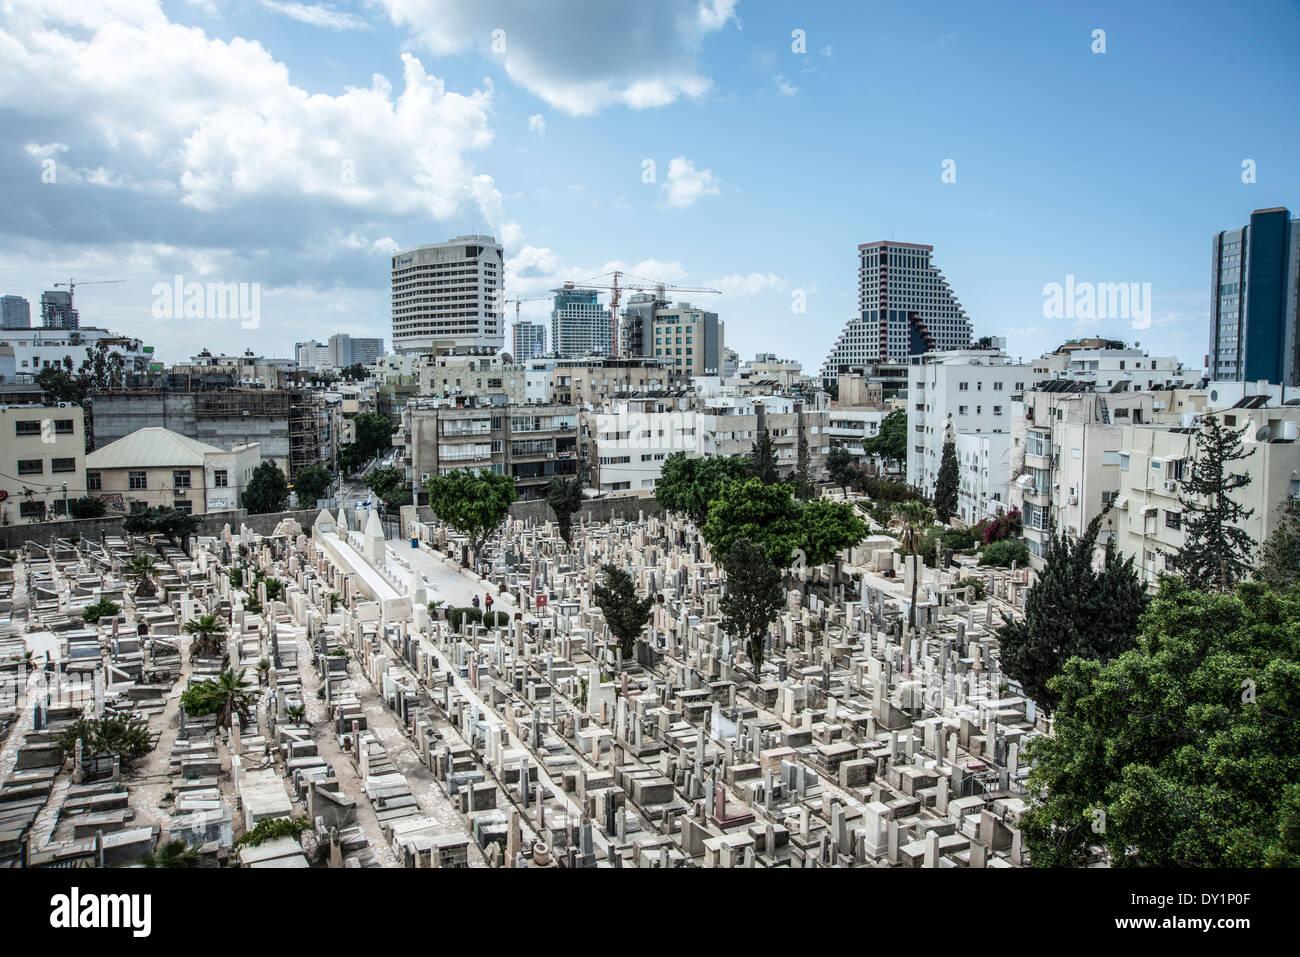 Elevated view of the old cemetery in Trumpeldor street, Tel Aviv, Israel - Stock Image